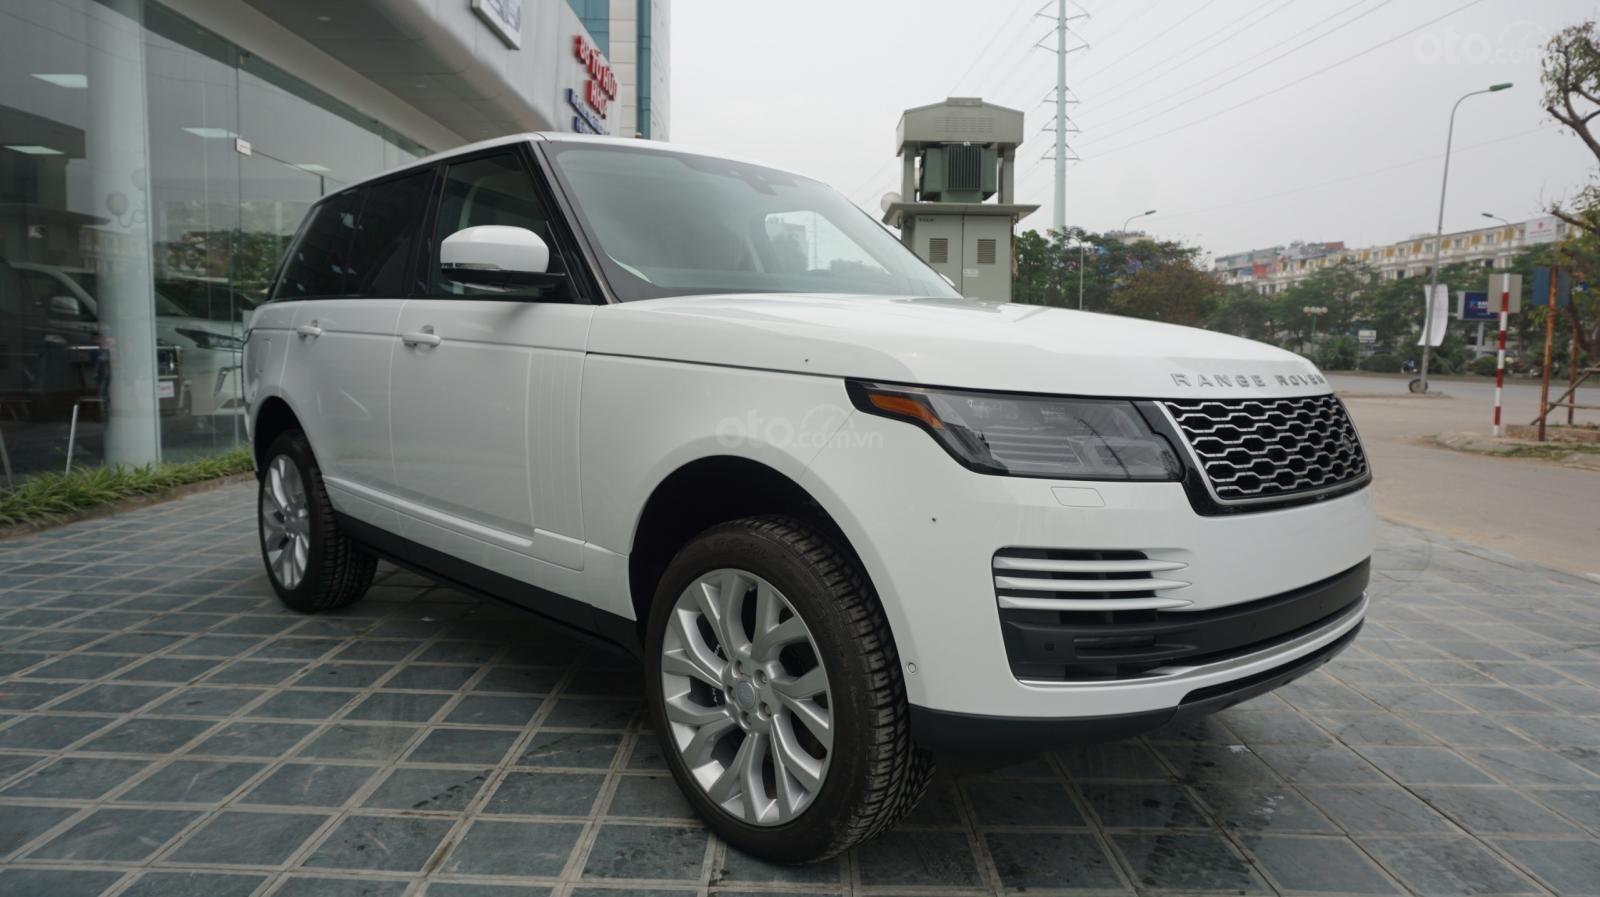 Cần bán xe LandRover Range Rover HSE năm 2019, màu trắng, xe nhập-1